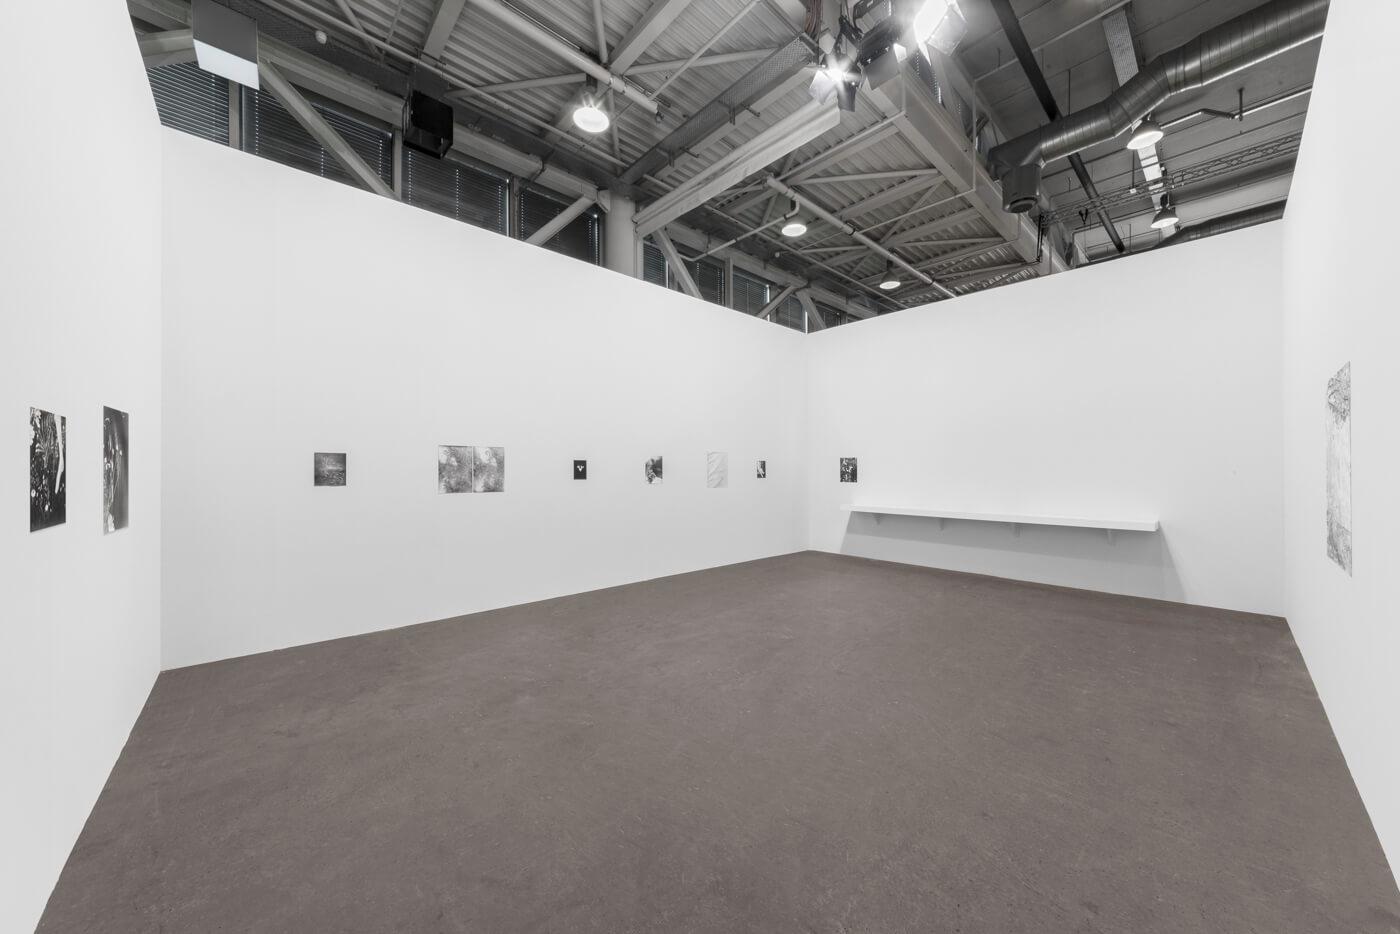 Installation view: Botanical Box, ProjecteSD, Art Unlimited | ART BASEL 2019 | ProjecteSD